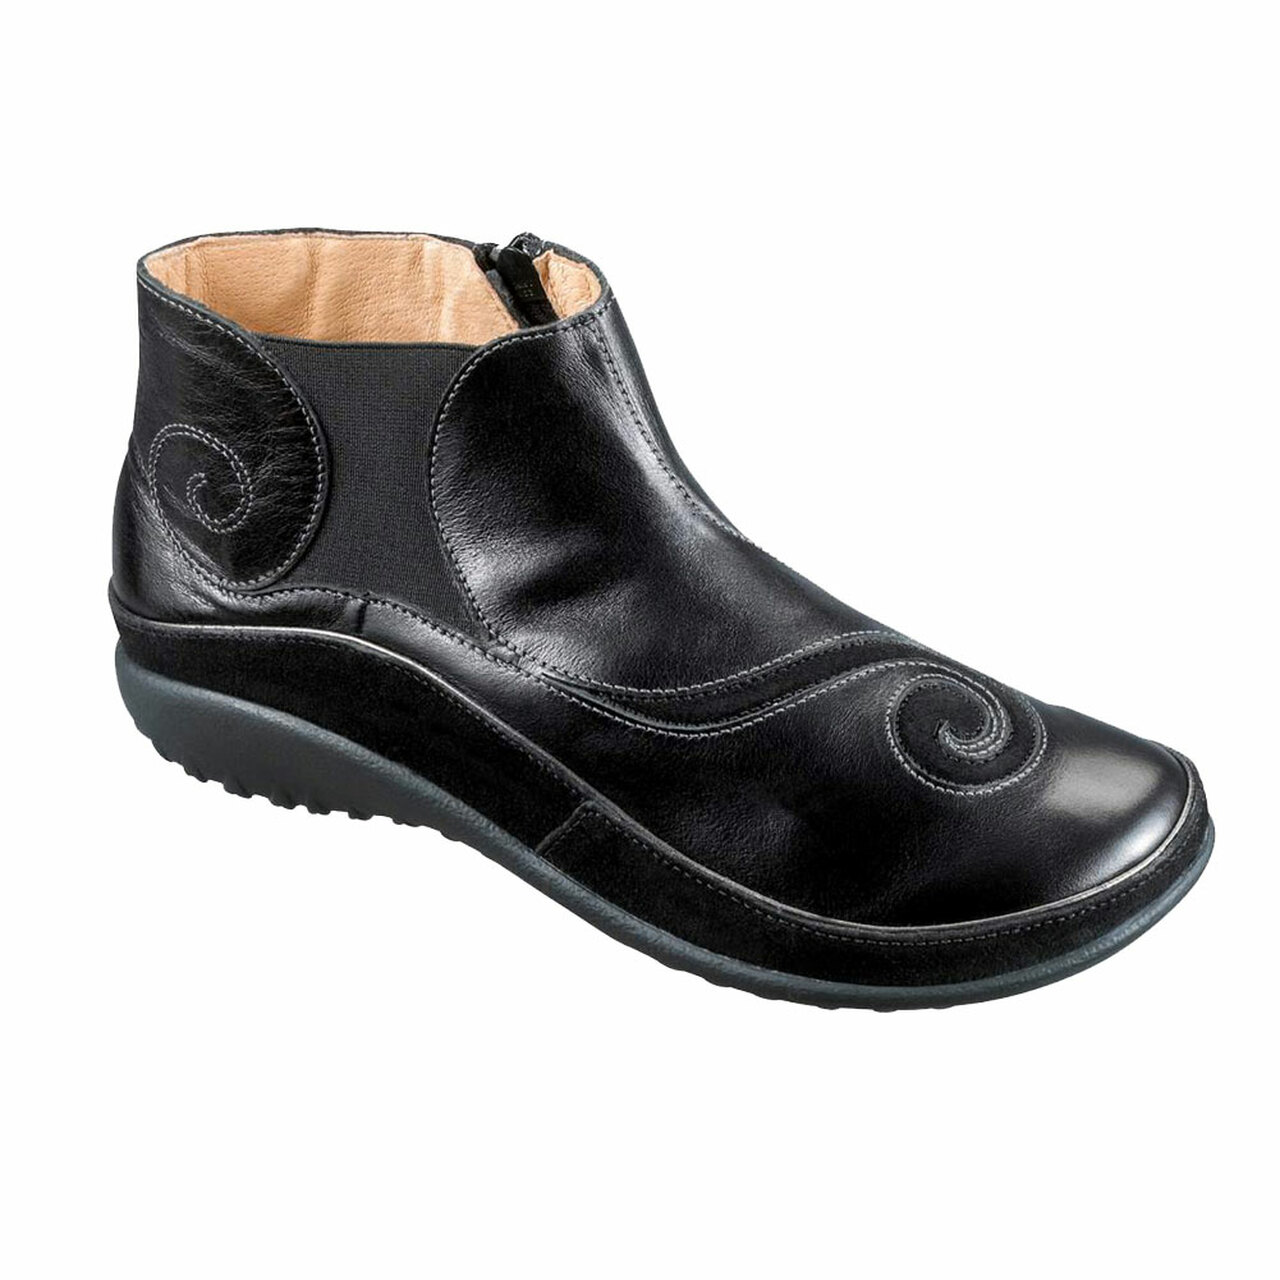 NAOT Womens Koru Chi Boots 11021-824